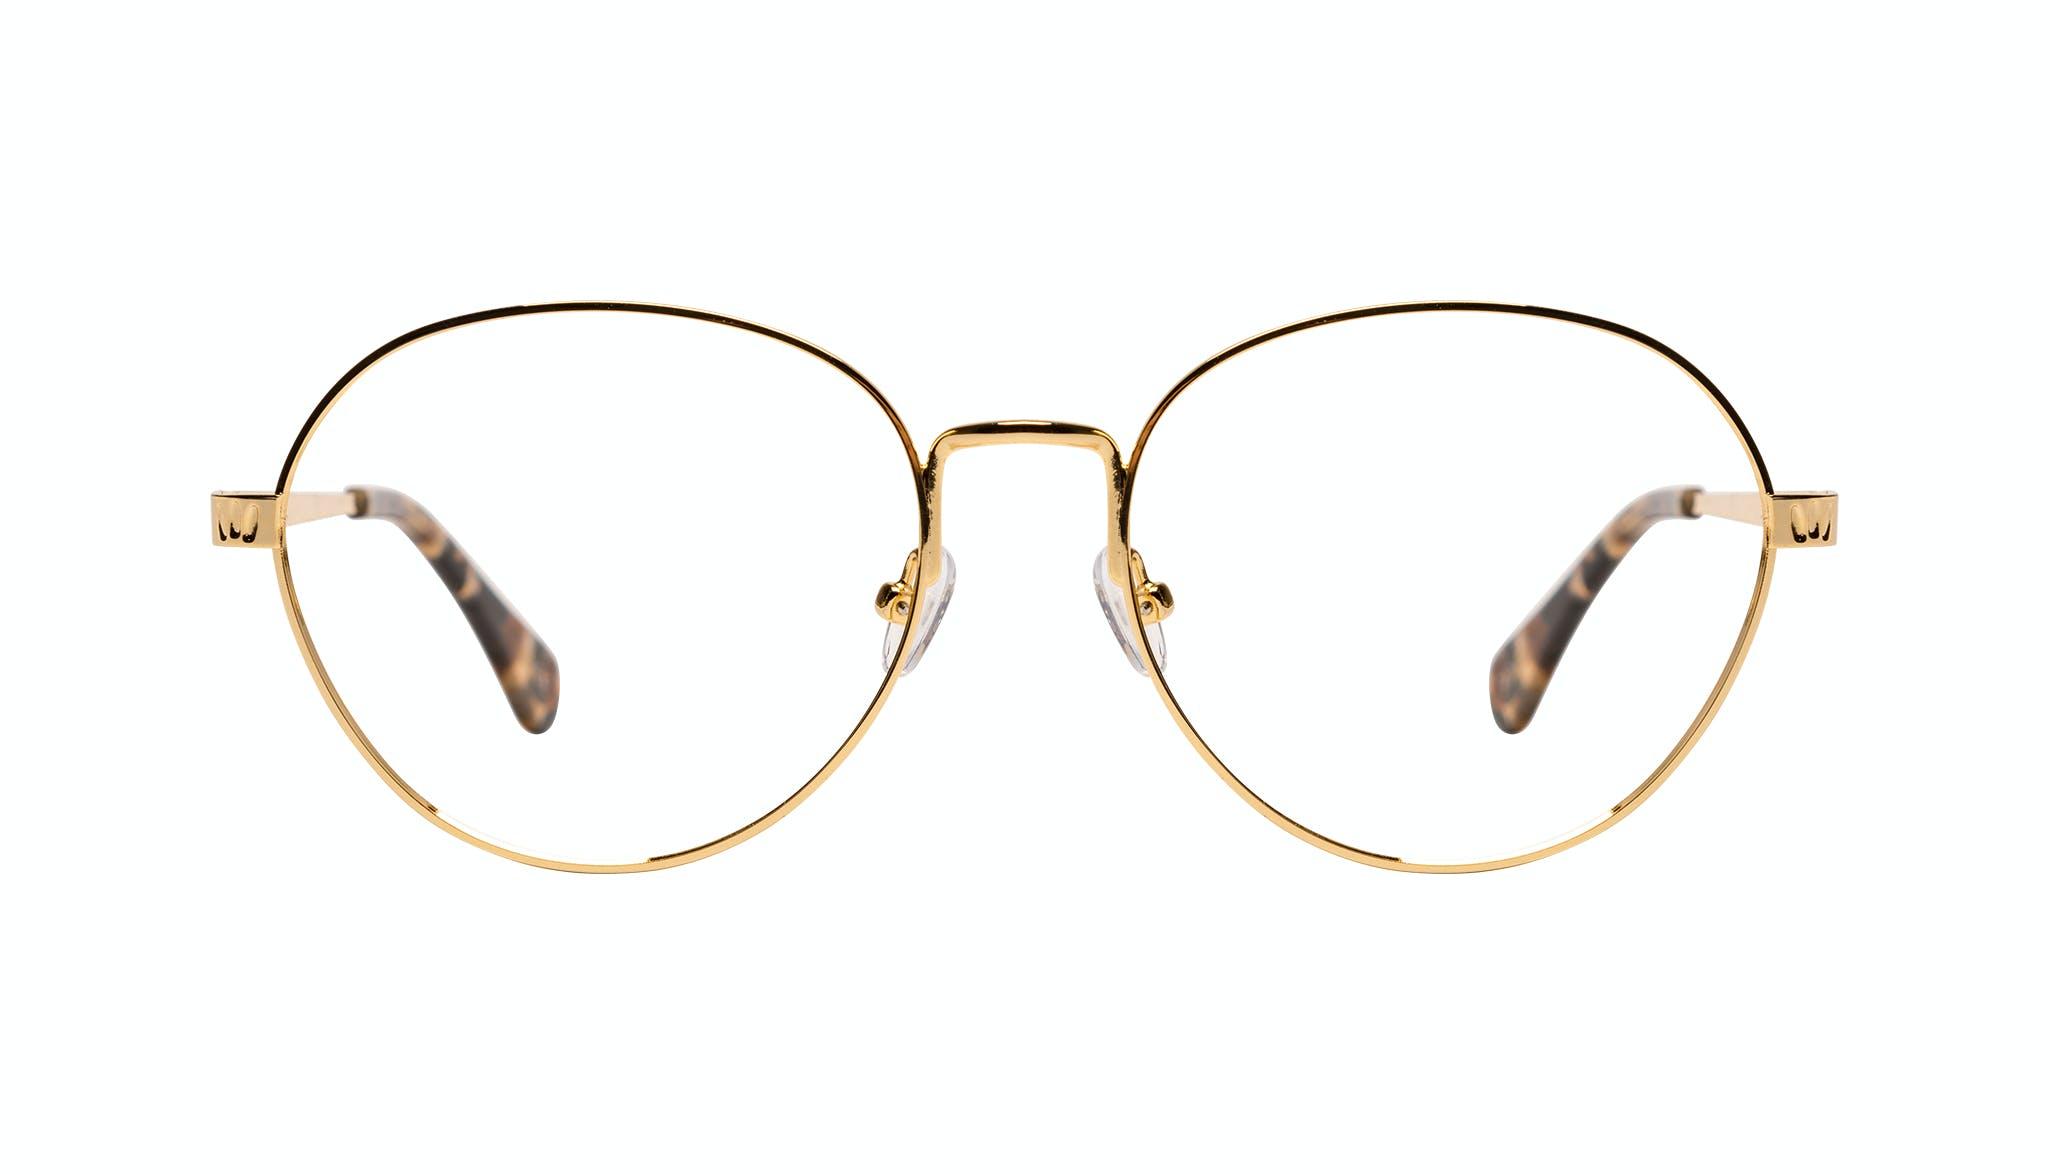 Affordable Fashion Glasses Round Eyeglasses Women Brace Plus Gold Front